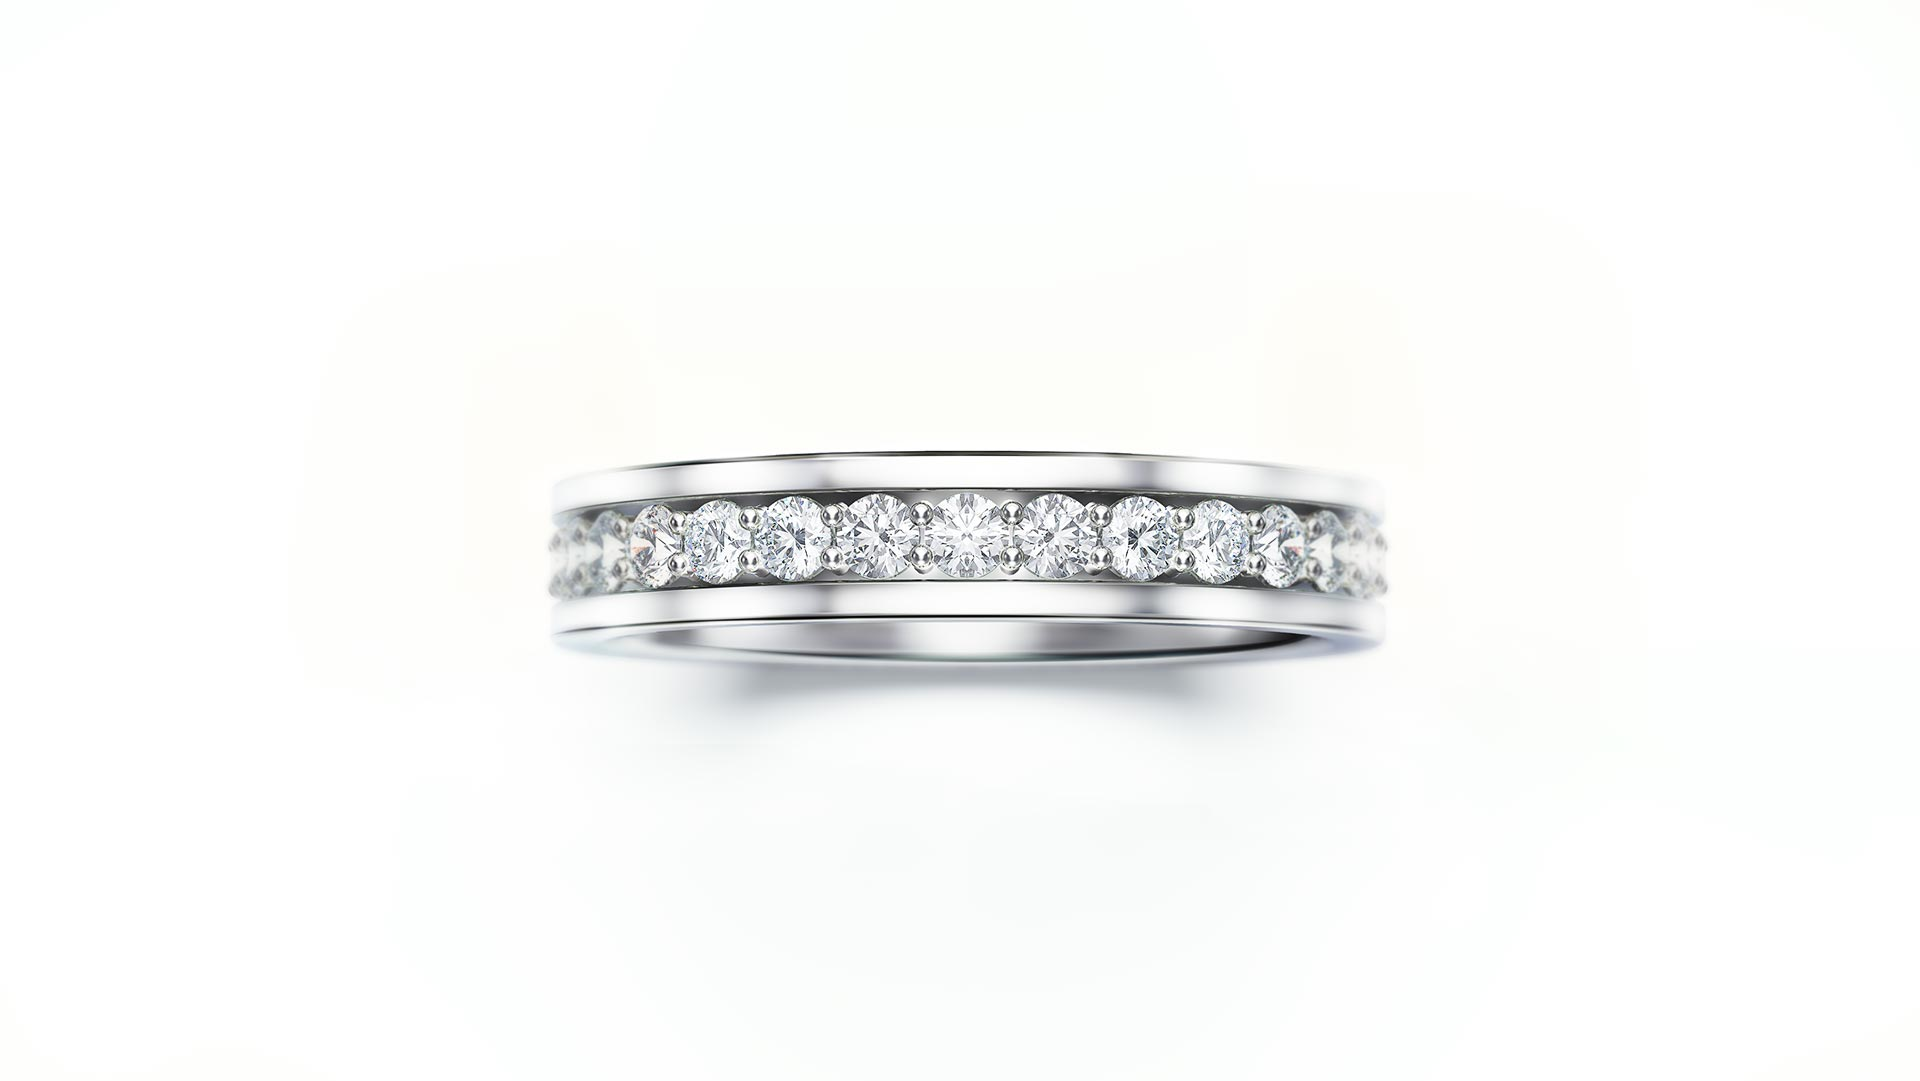 Diamond Ring E-Commerce